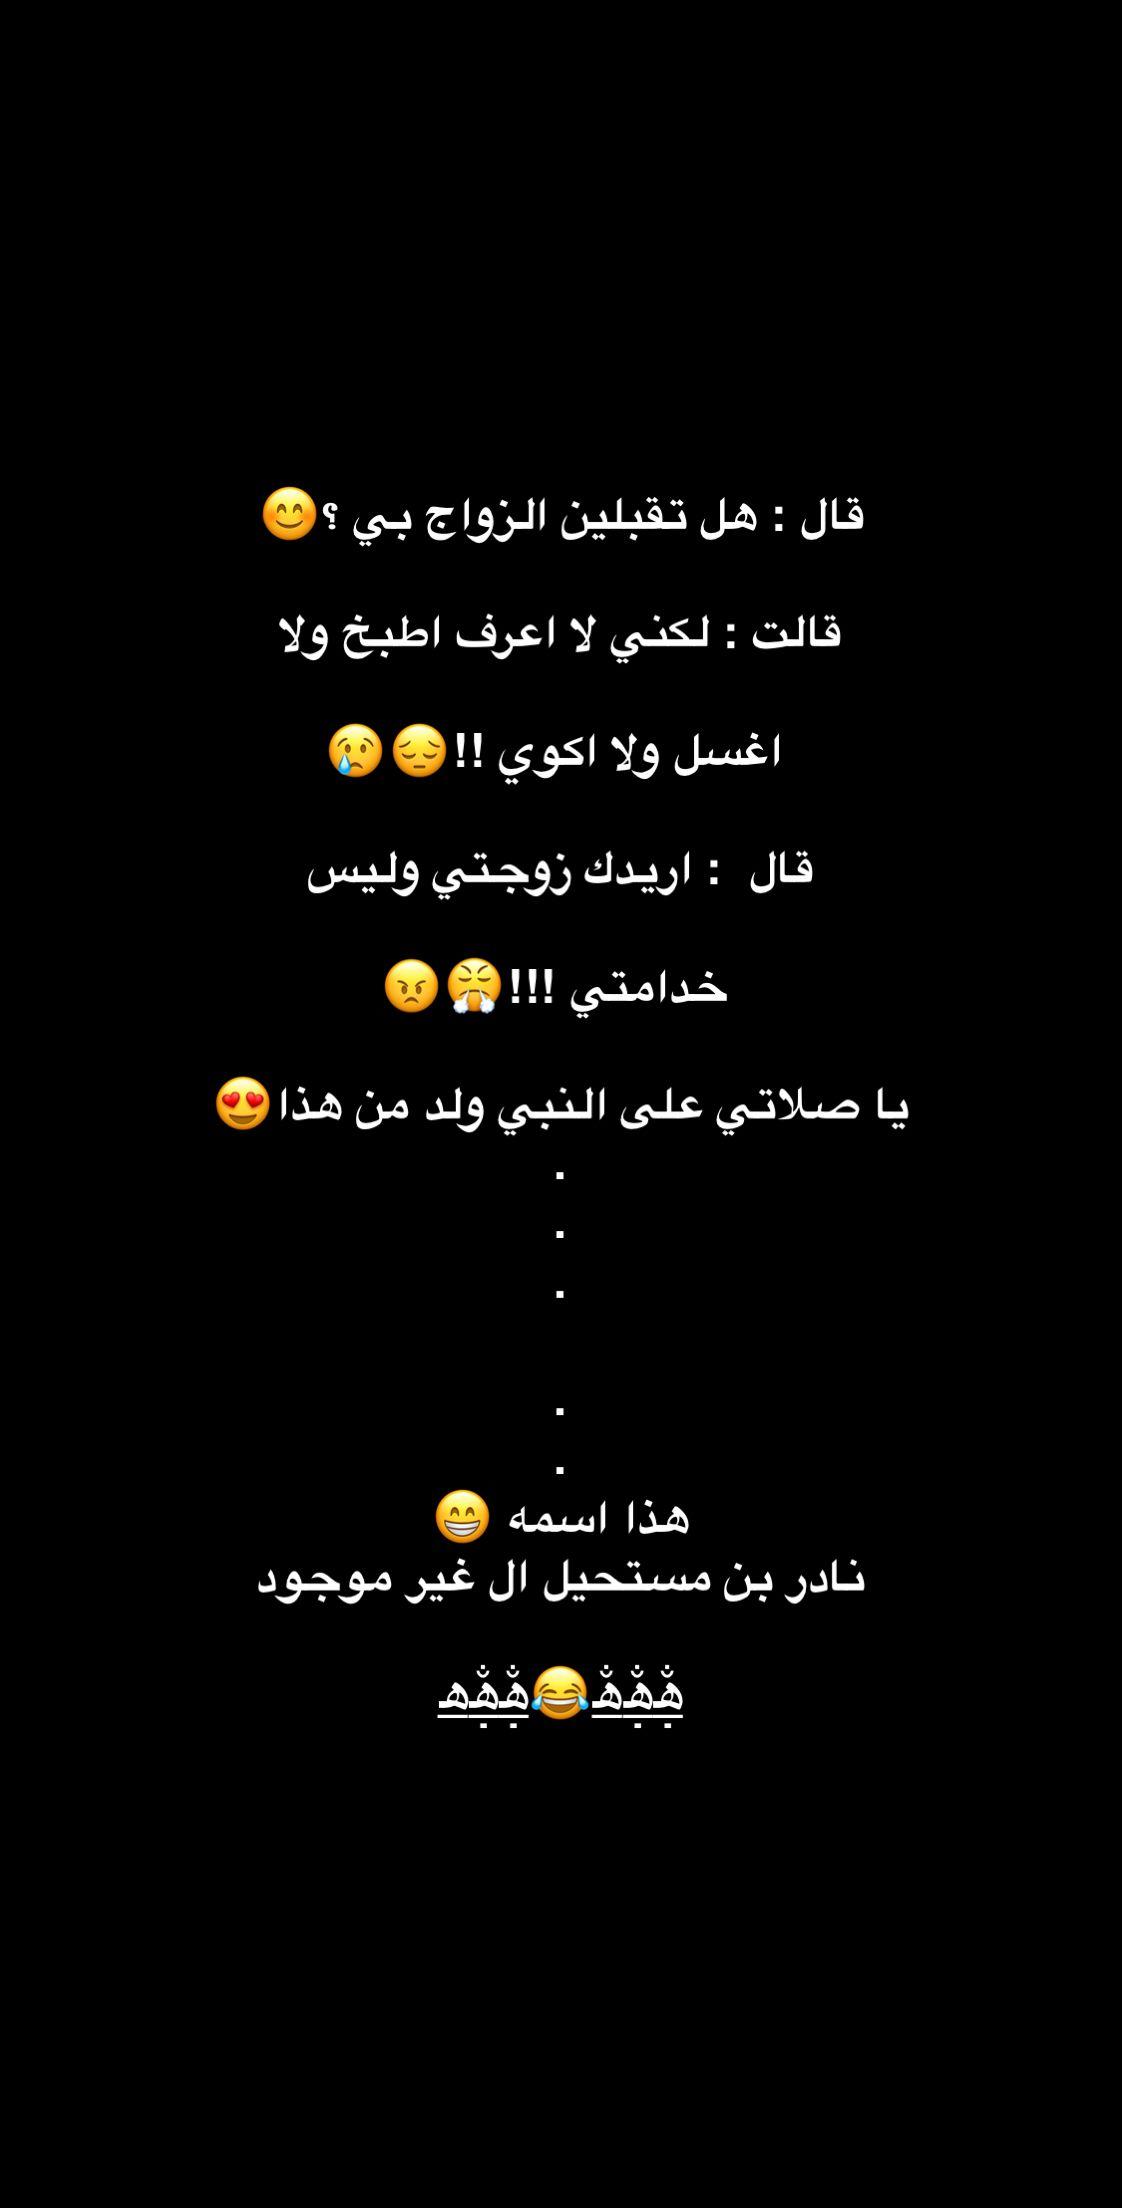 Pin By Rặgĥŏoŏd Awwặd On ابتسموا ي جميلين Funny Words Funny Arabic Quotes Mood Quotes